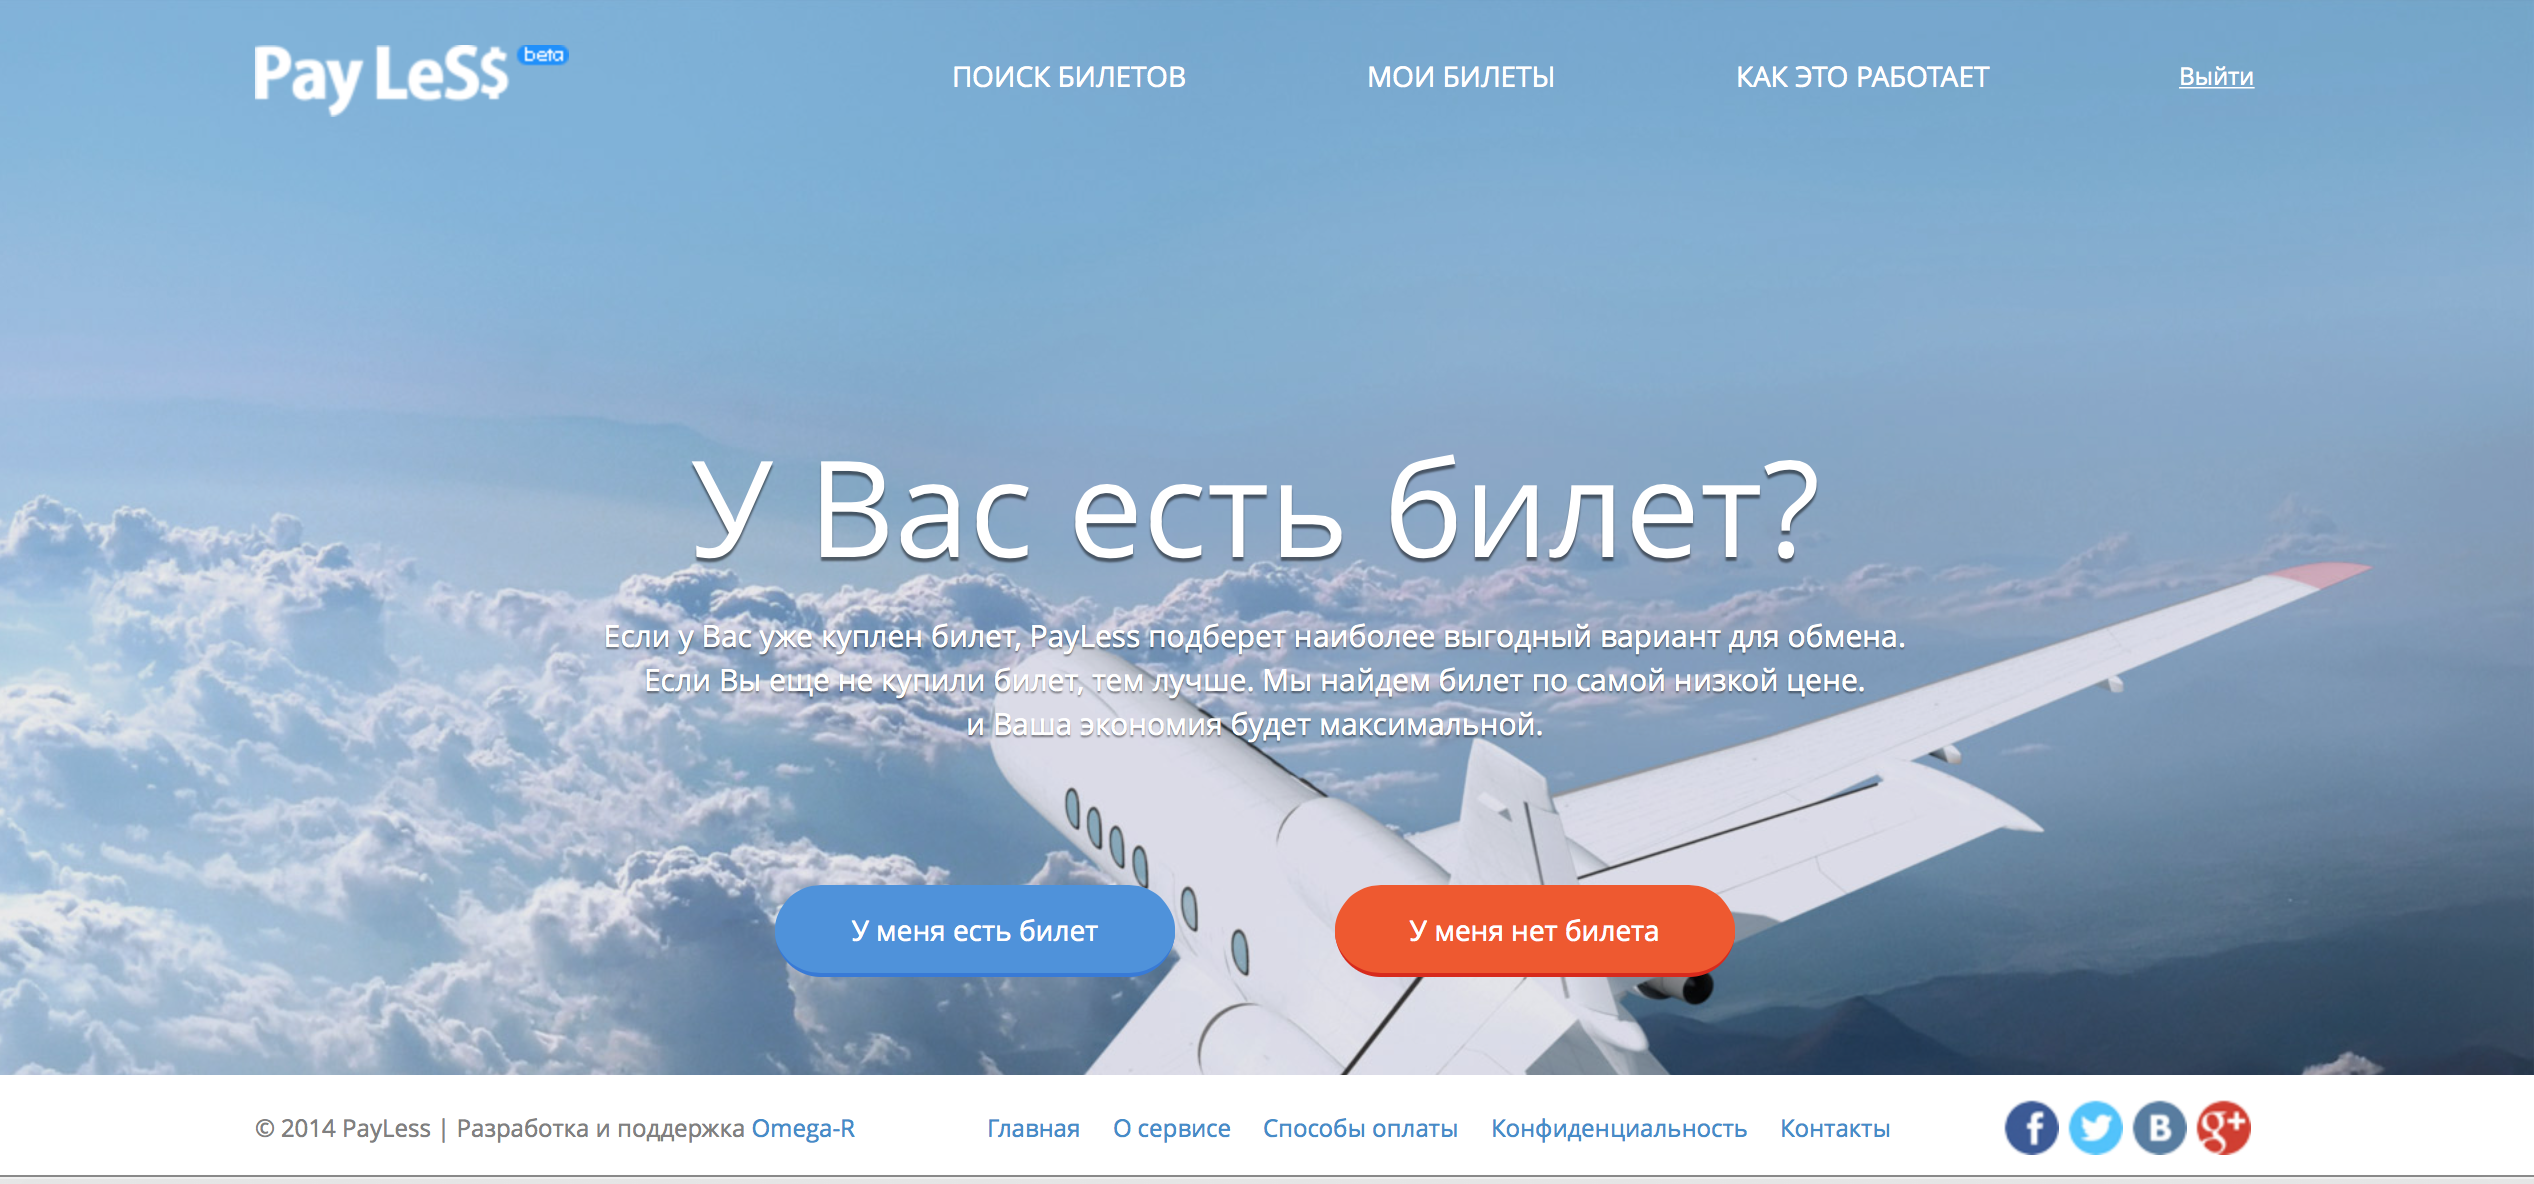 Цена билета на самолет в киев